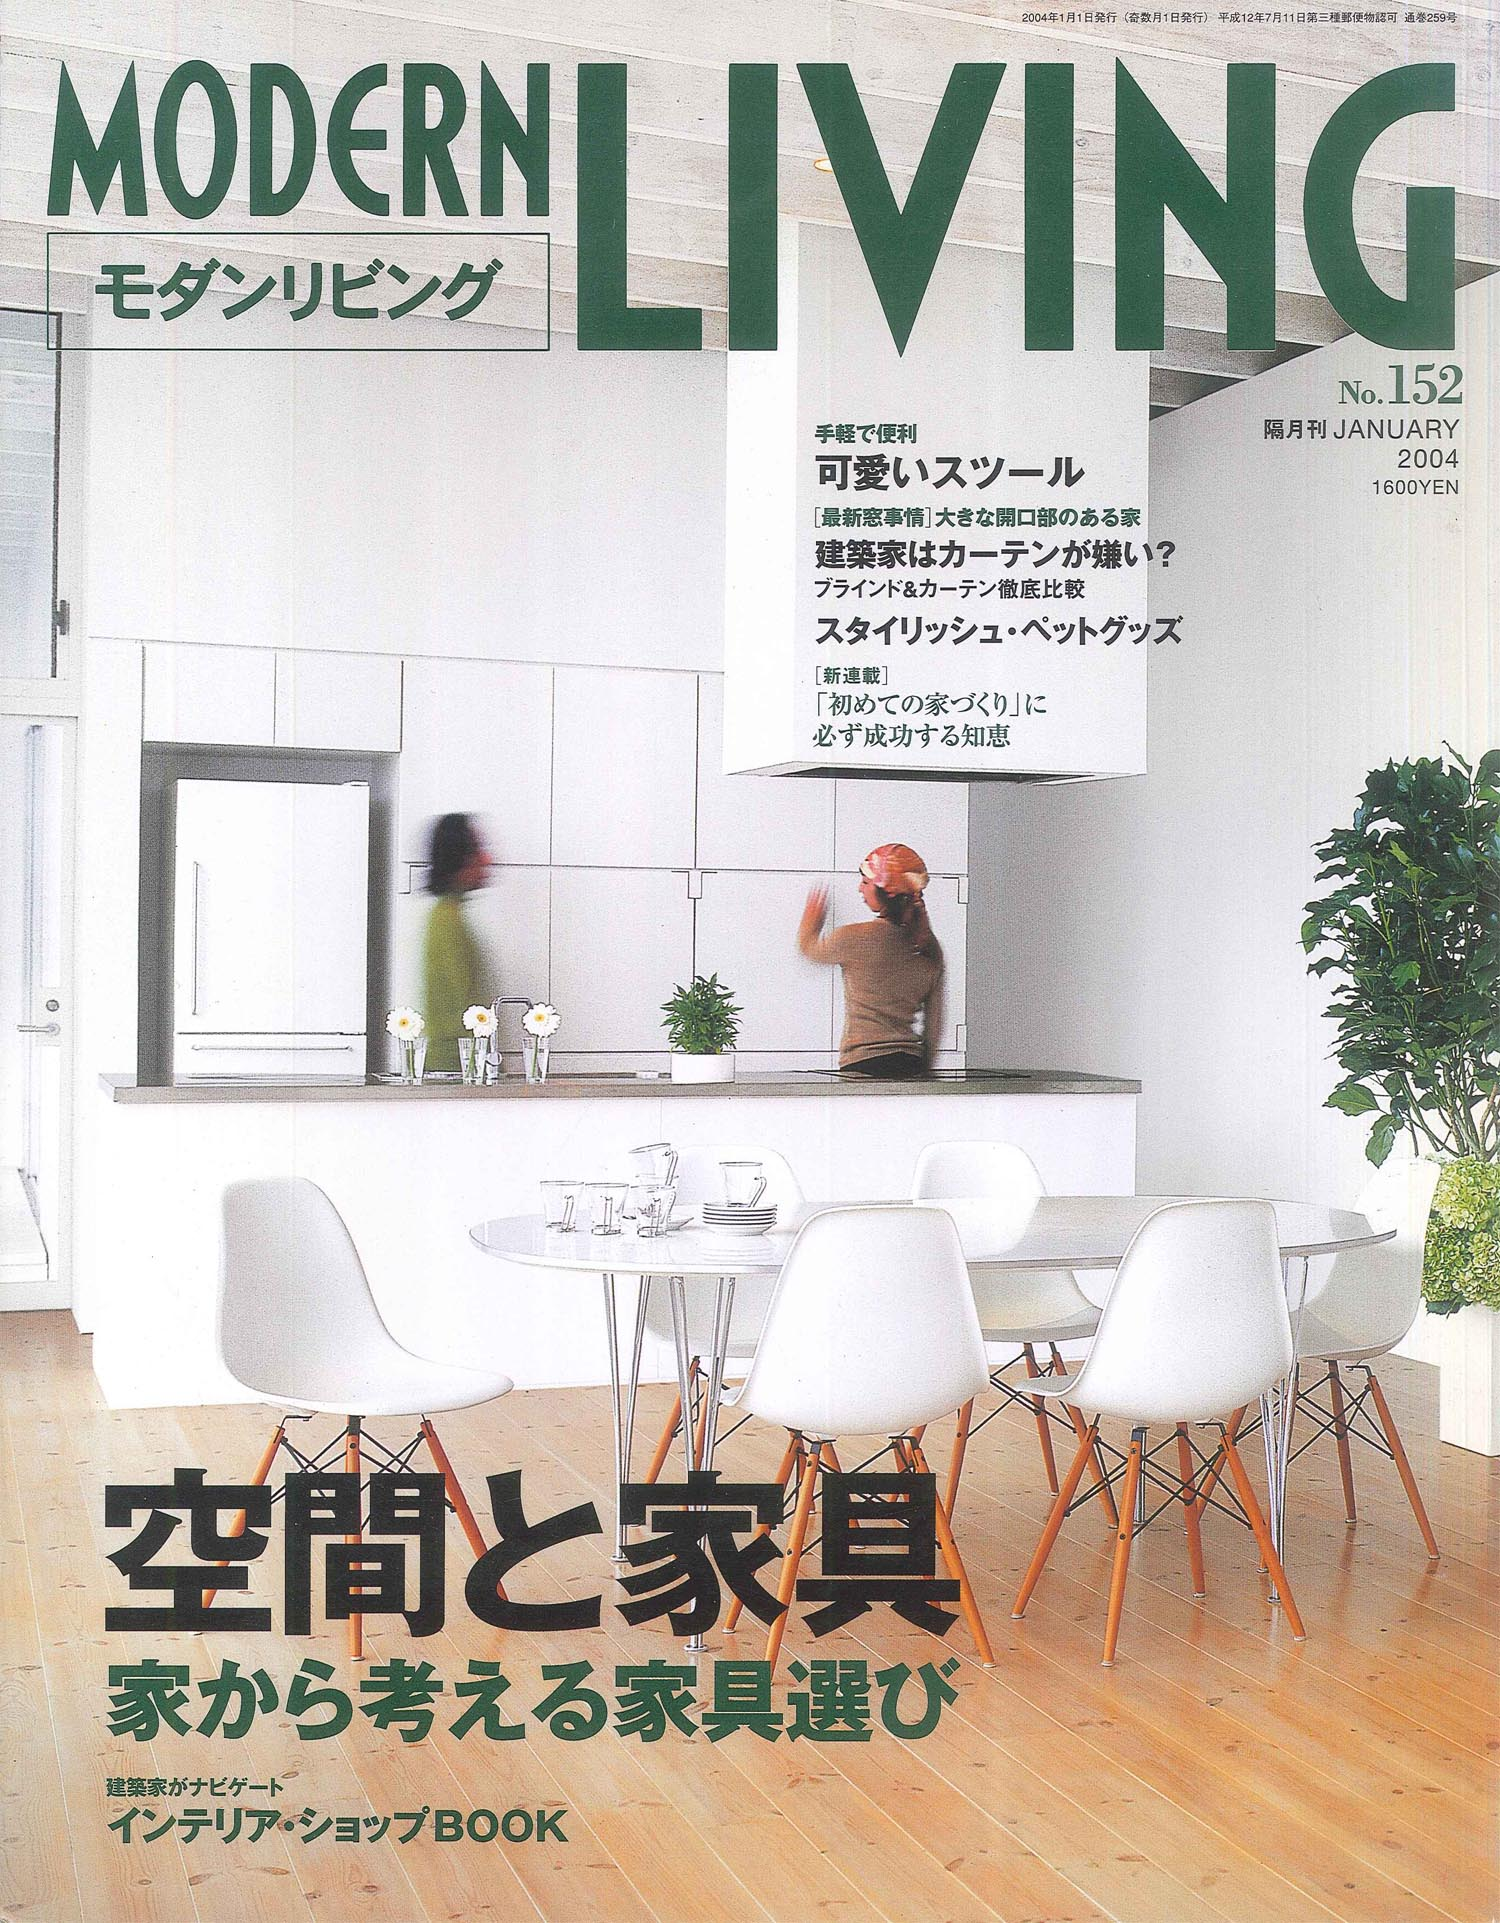 mg concrete furniture series